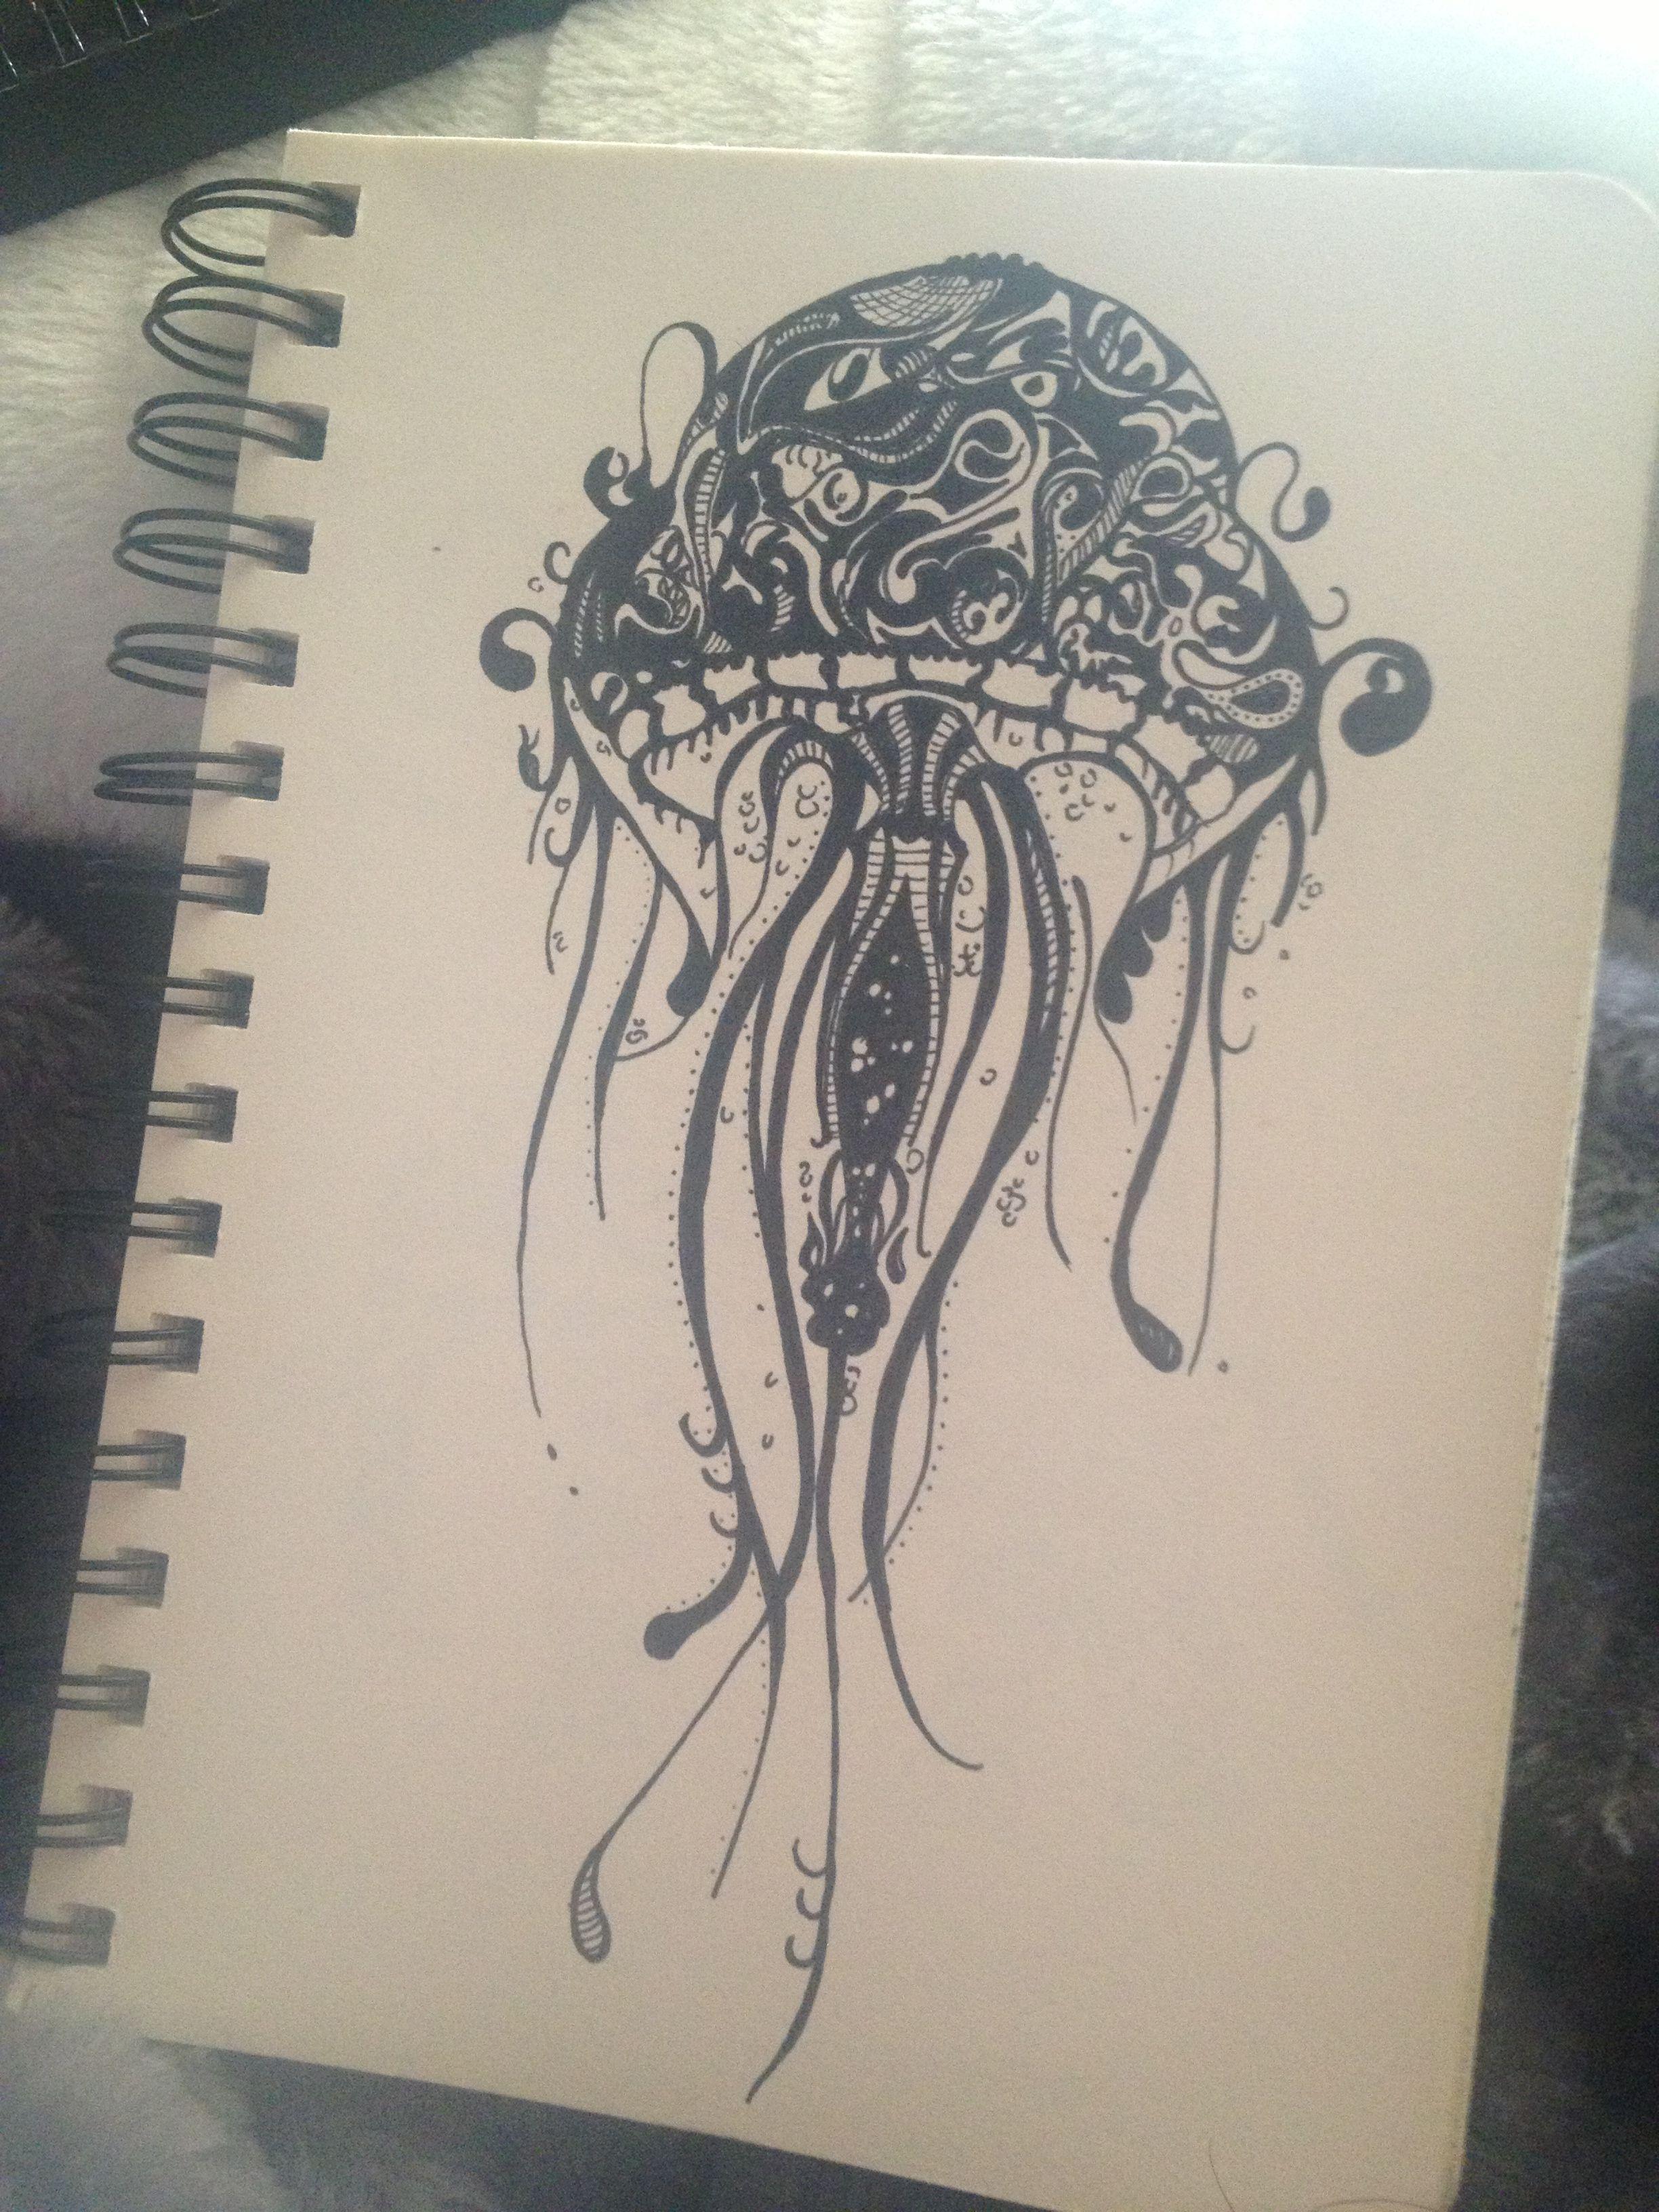 Line Drawing Jellyfish : Drawing jellyfish doodle pattern art